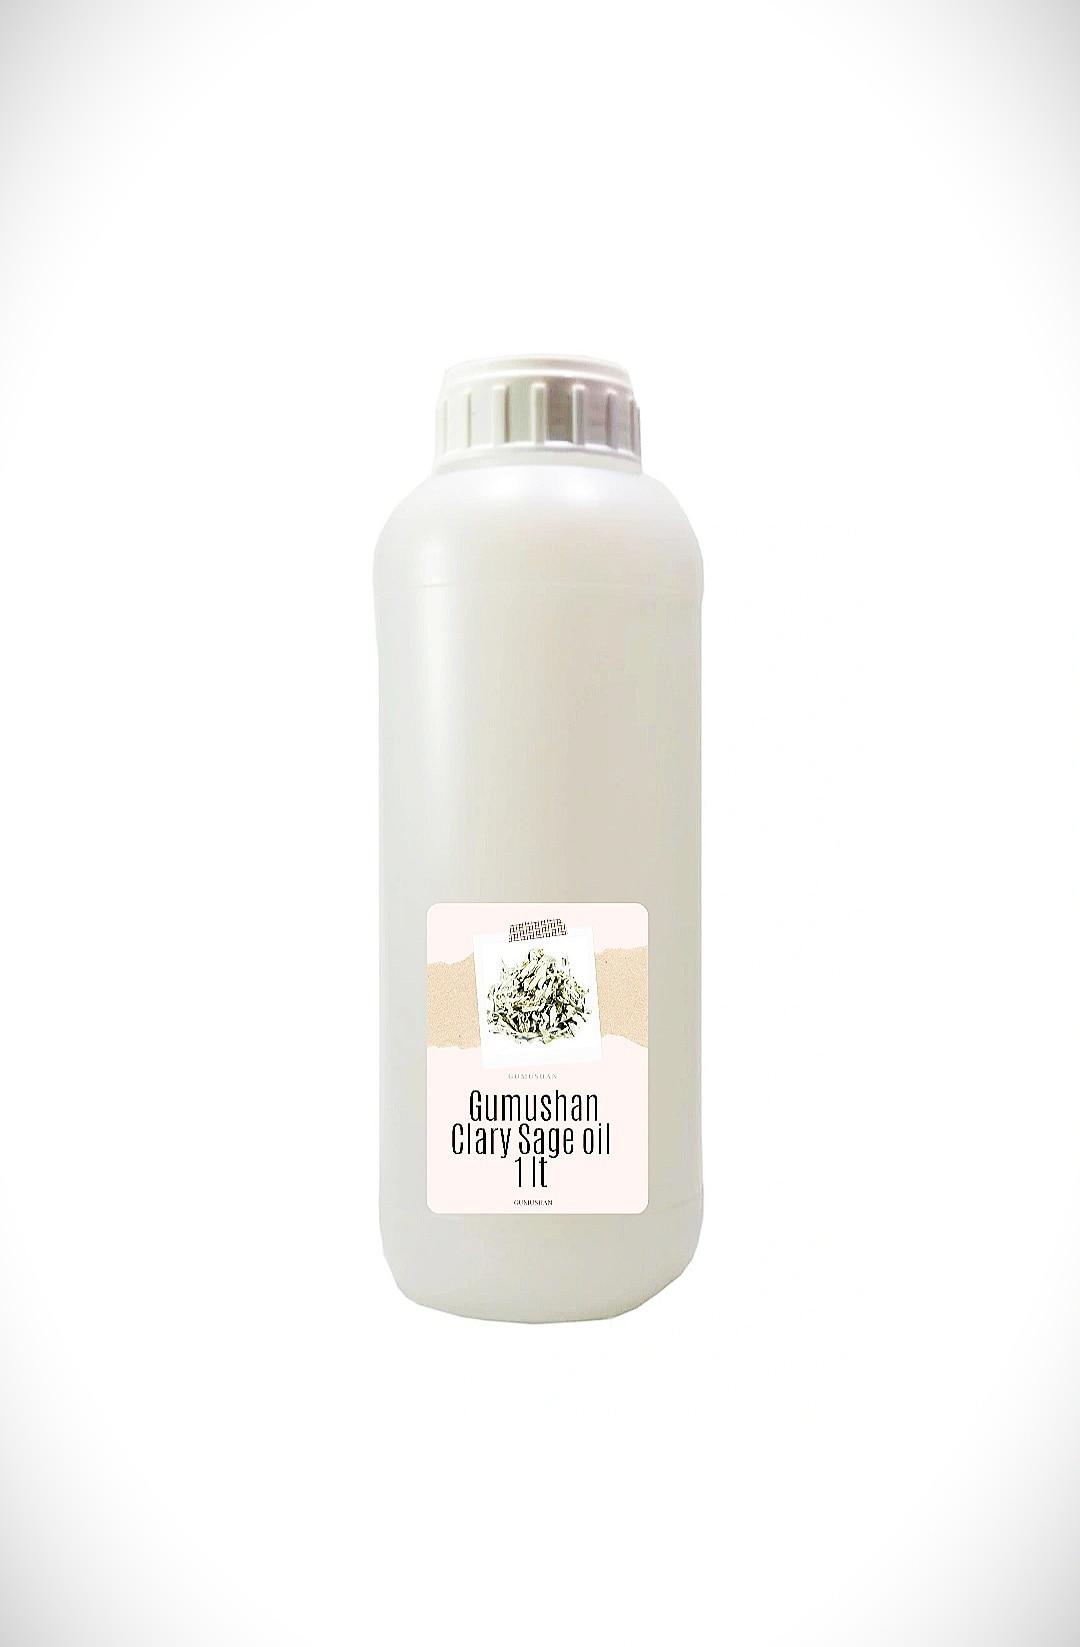 High quality pure Clary Sage Oil 1 liter 34 fl oz 1000ml